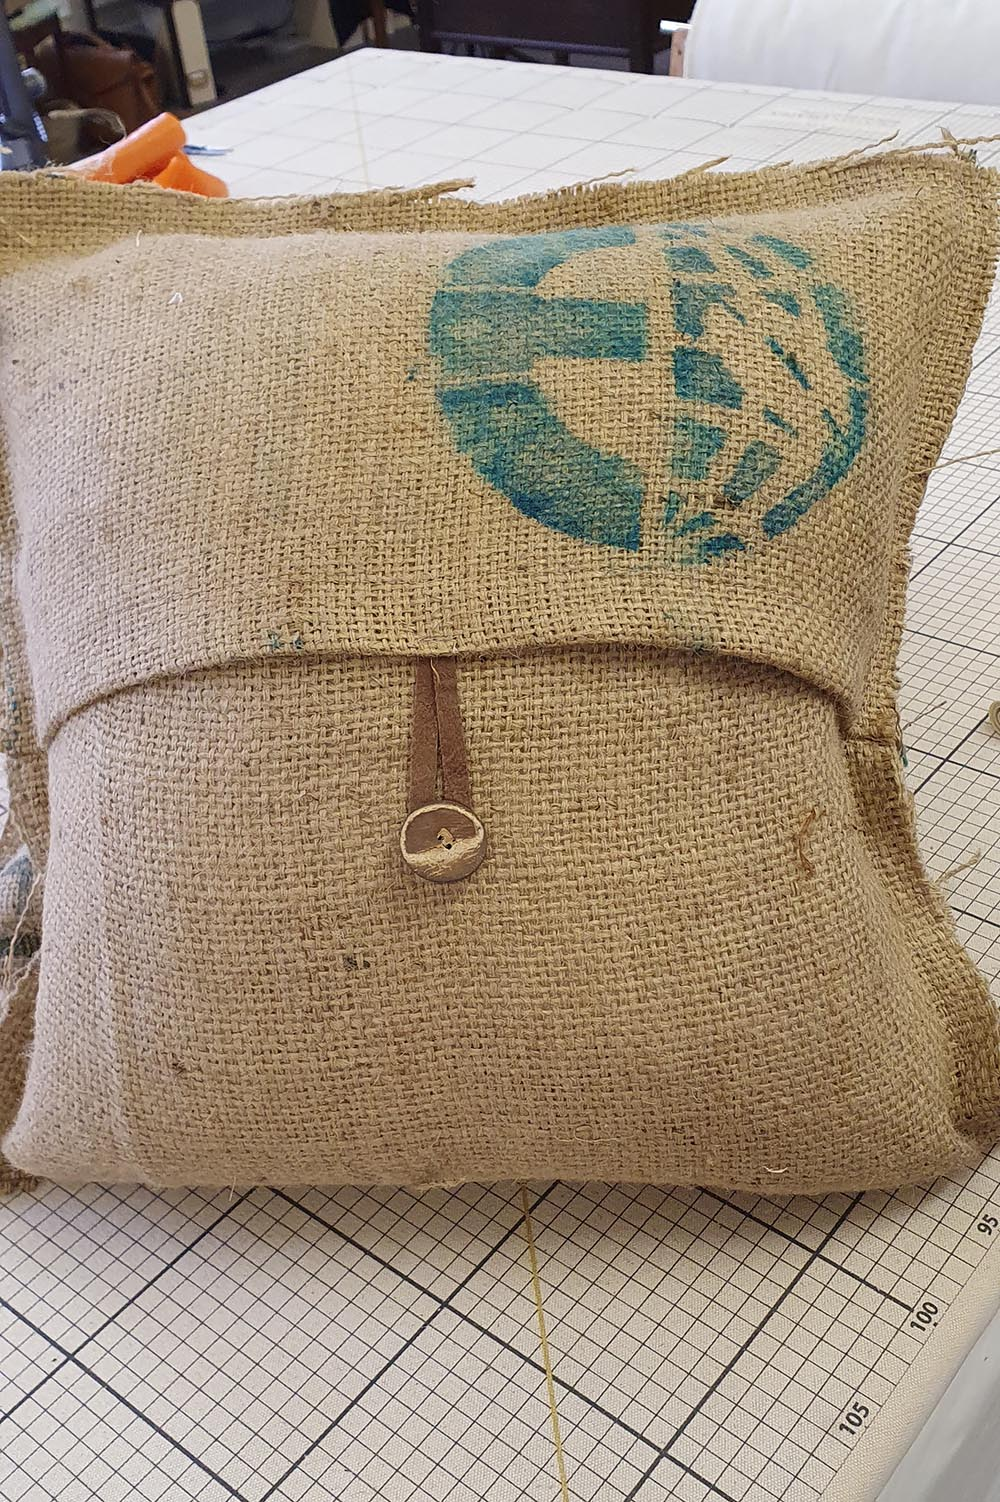 Repurposed coffee sacks